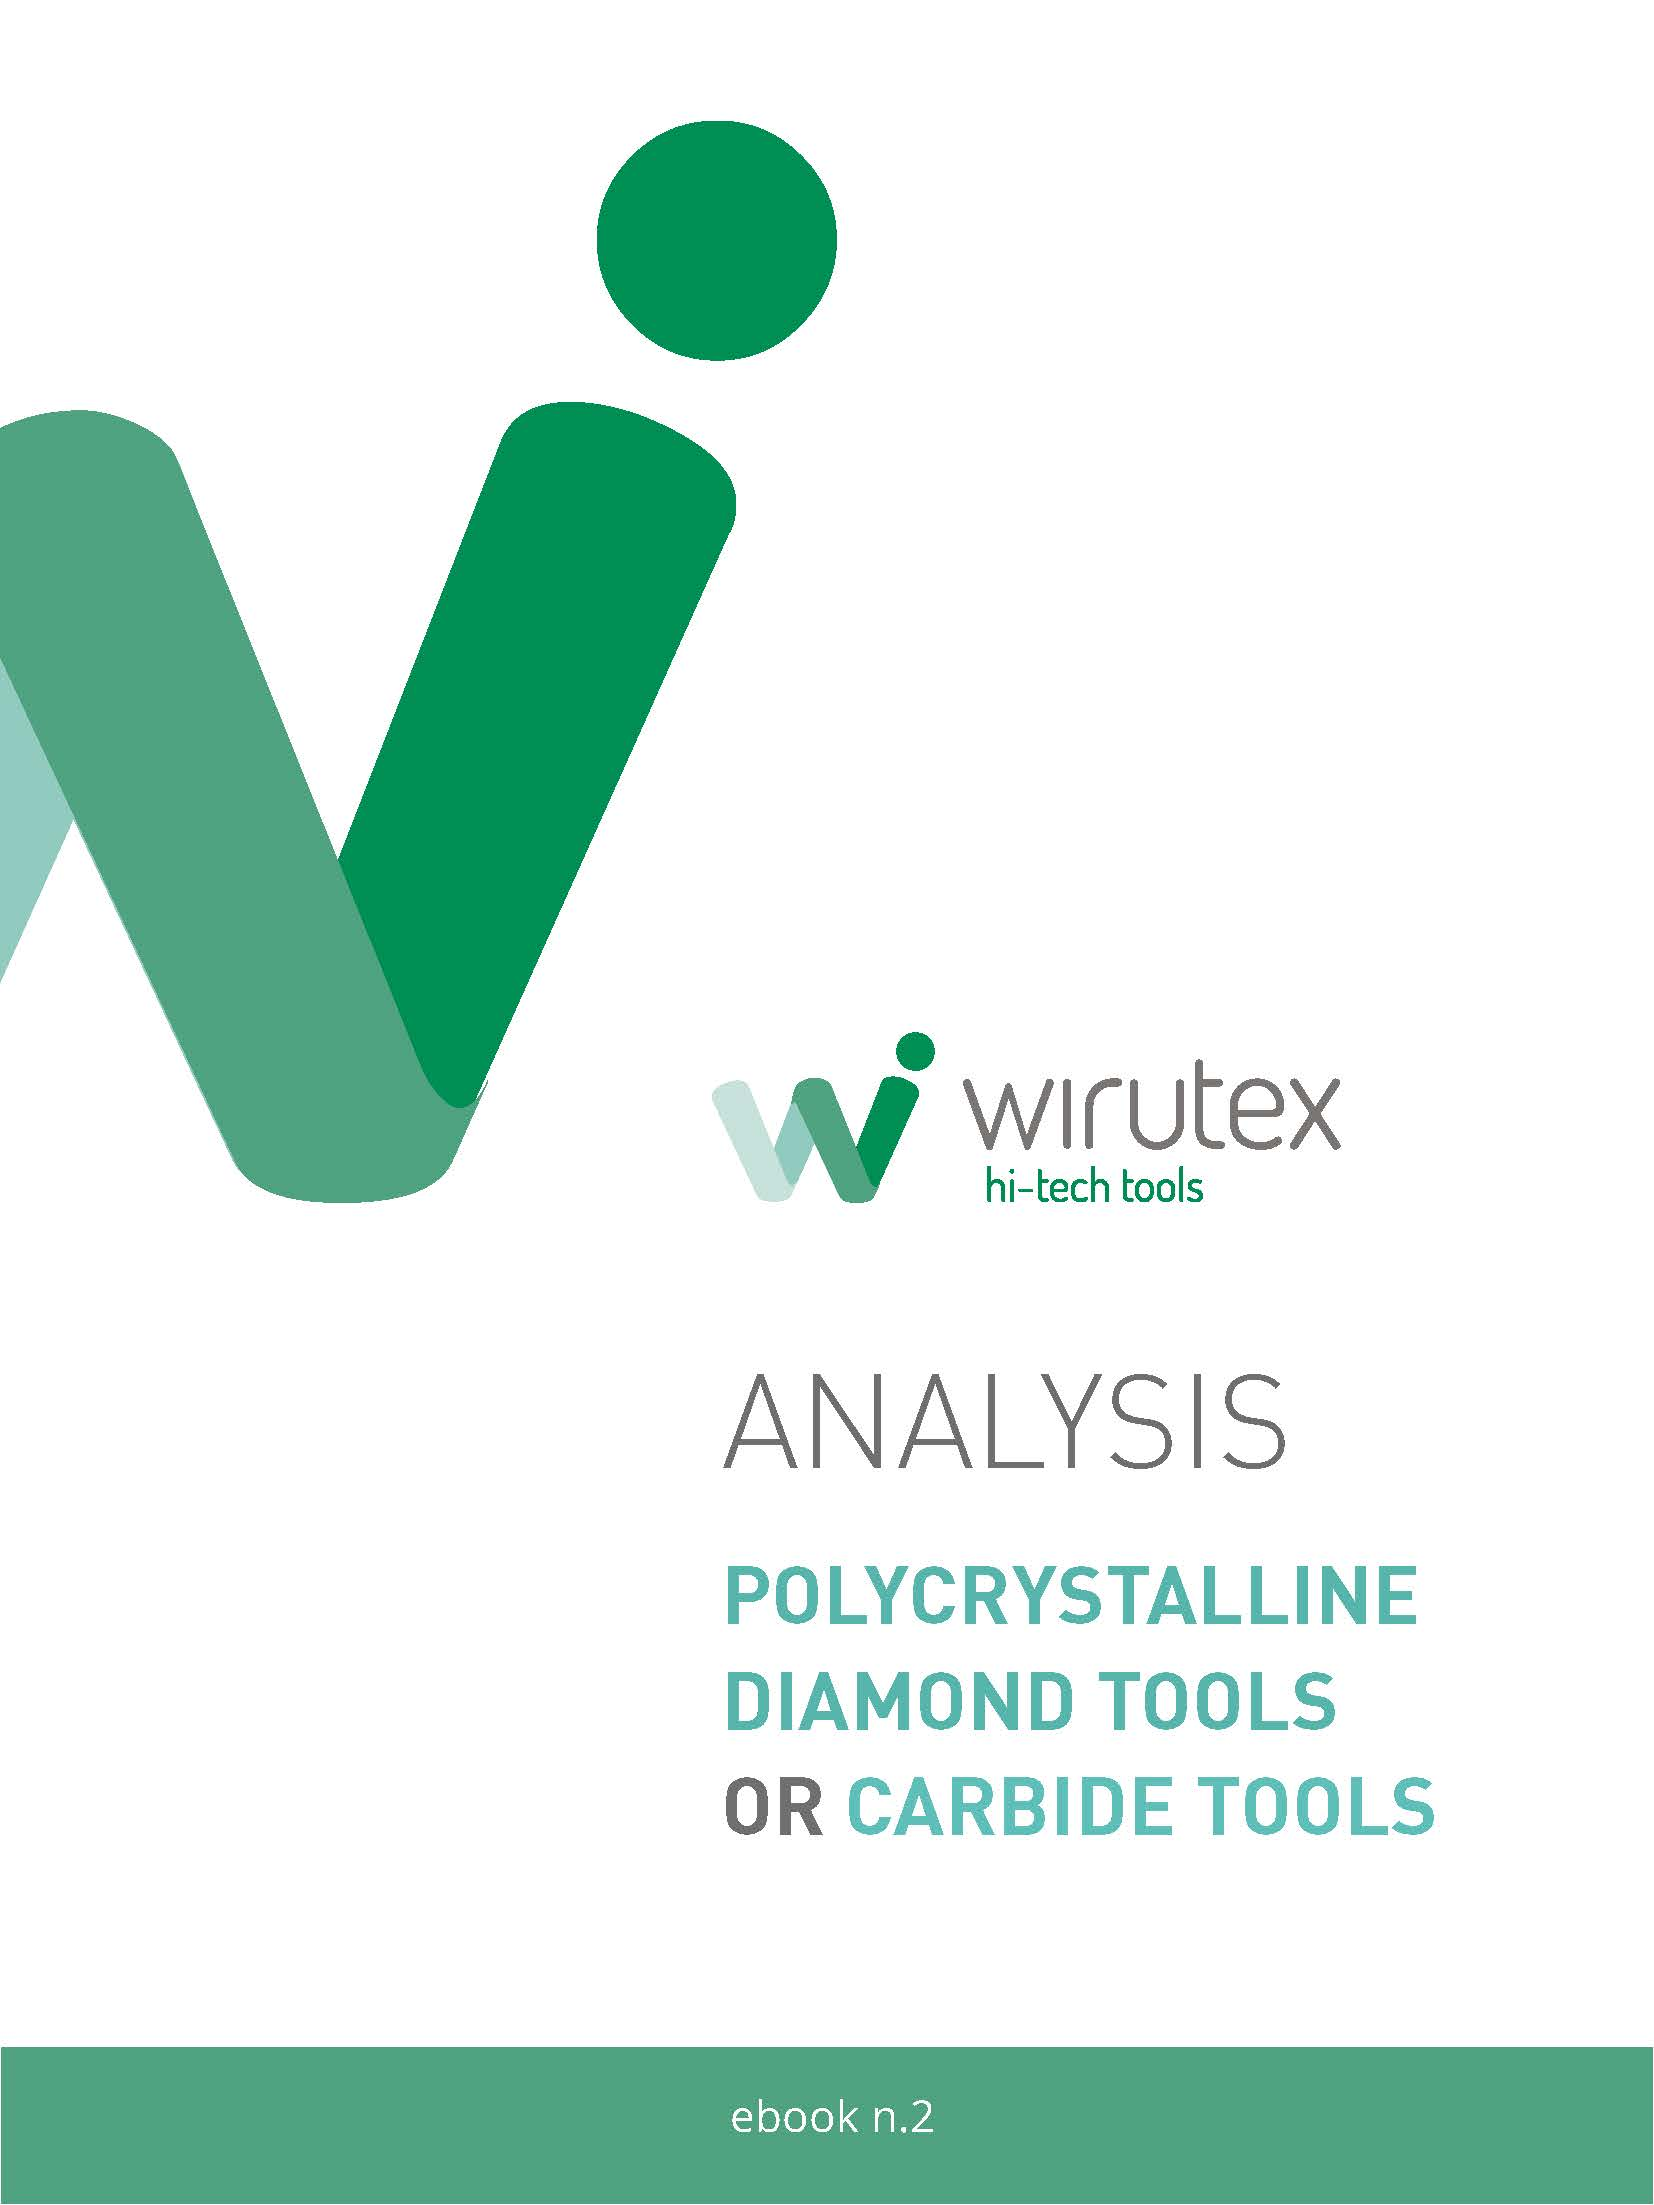 Polycrystalline diamond and carbide tools